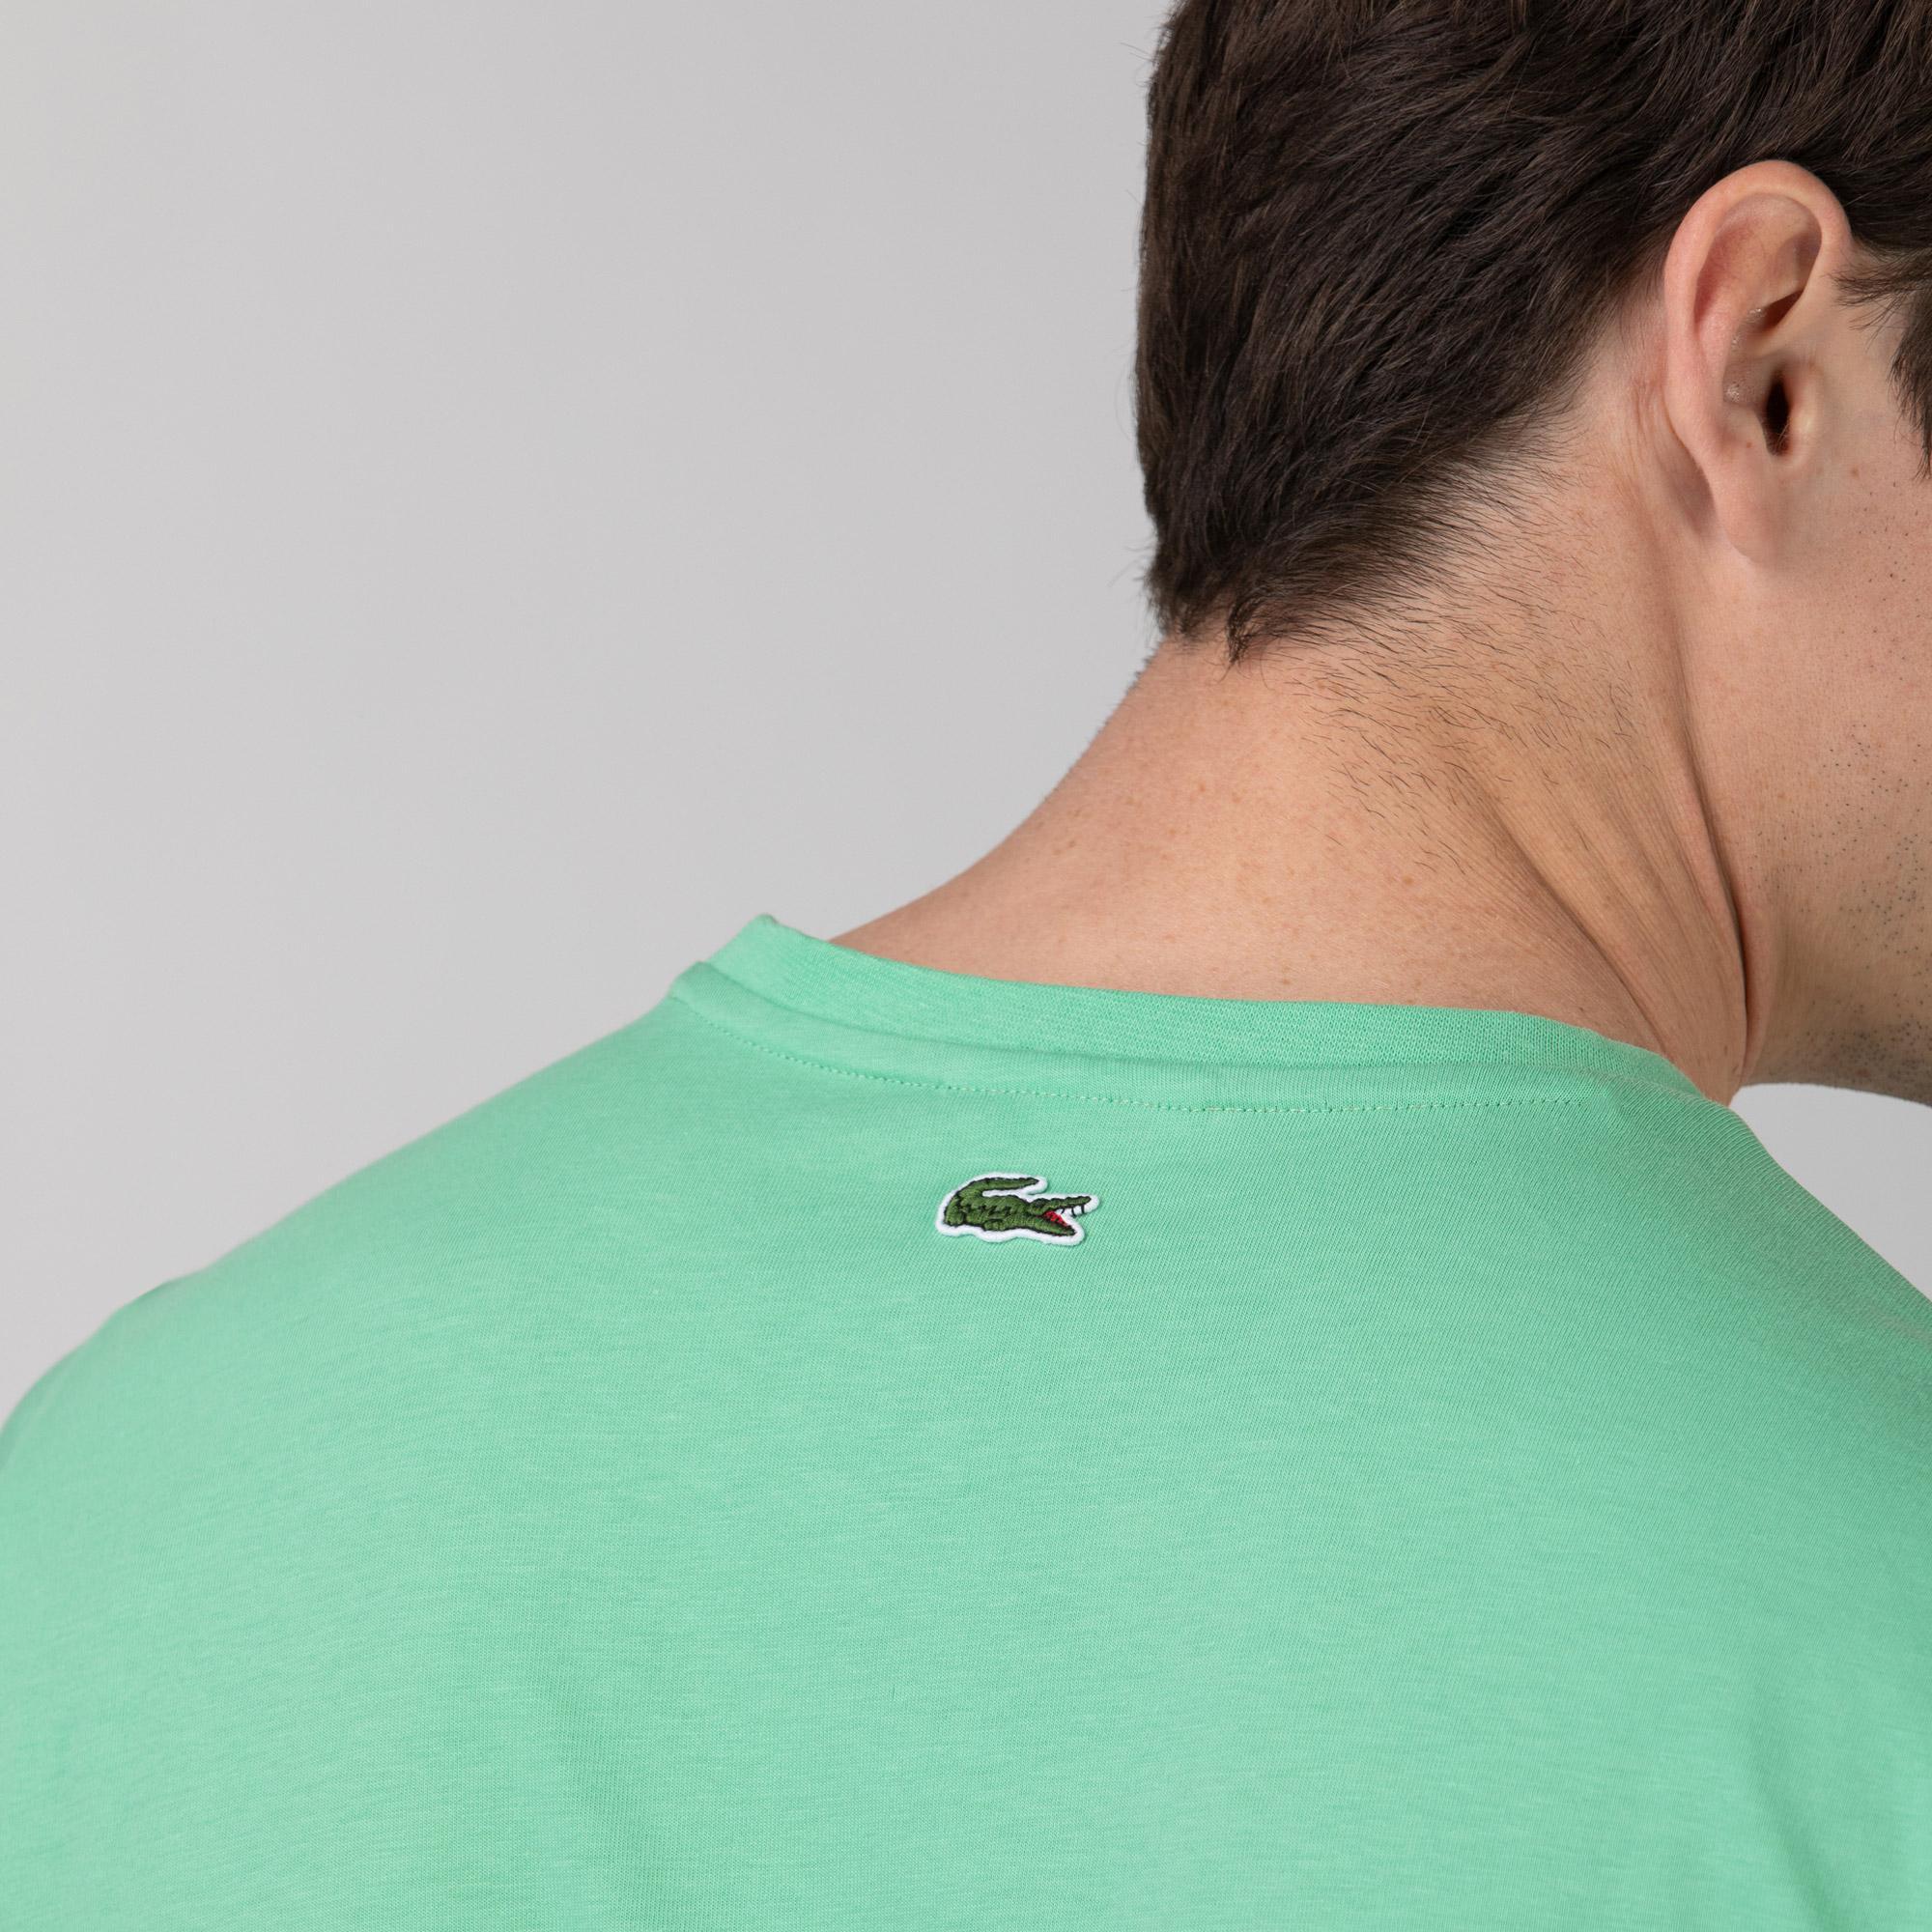 Lacoste Erkek Regular Fit Bisiklet Yaka Baskılı Yeşil T-Shirt